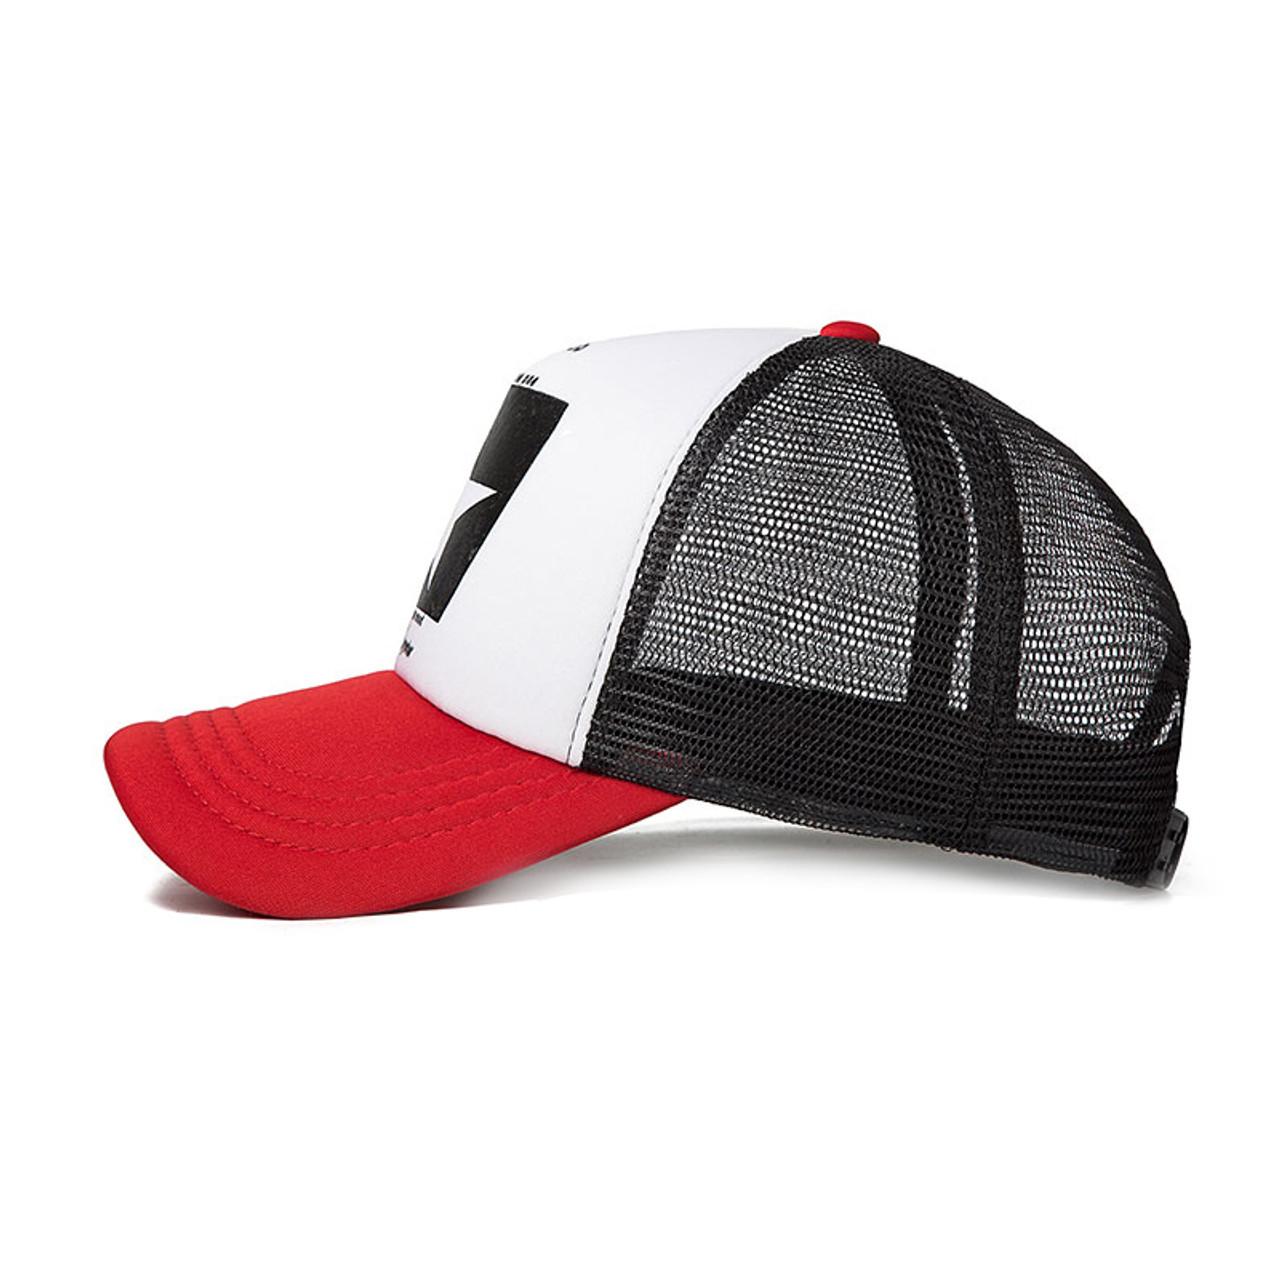 4dd9253e46827 ... SuperB amp G 2018 Fashion Summer Baseball Cap Women Men Mesh Breathable  Snapback Cap Unisex Adjustable ...